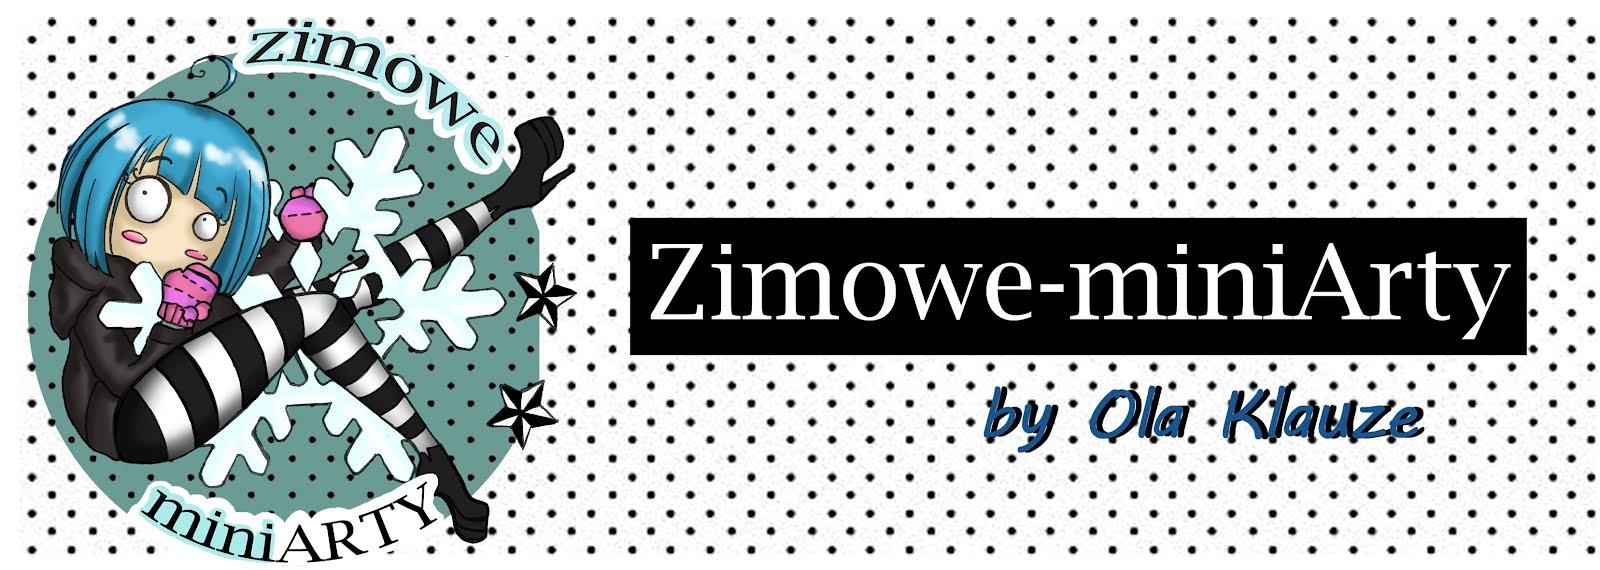 zimowe-miniARTY